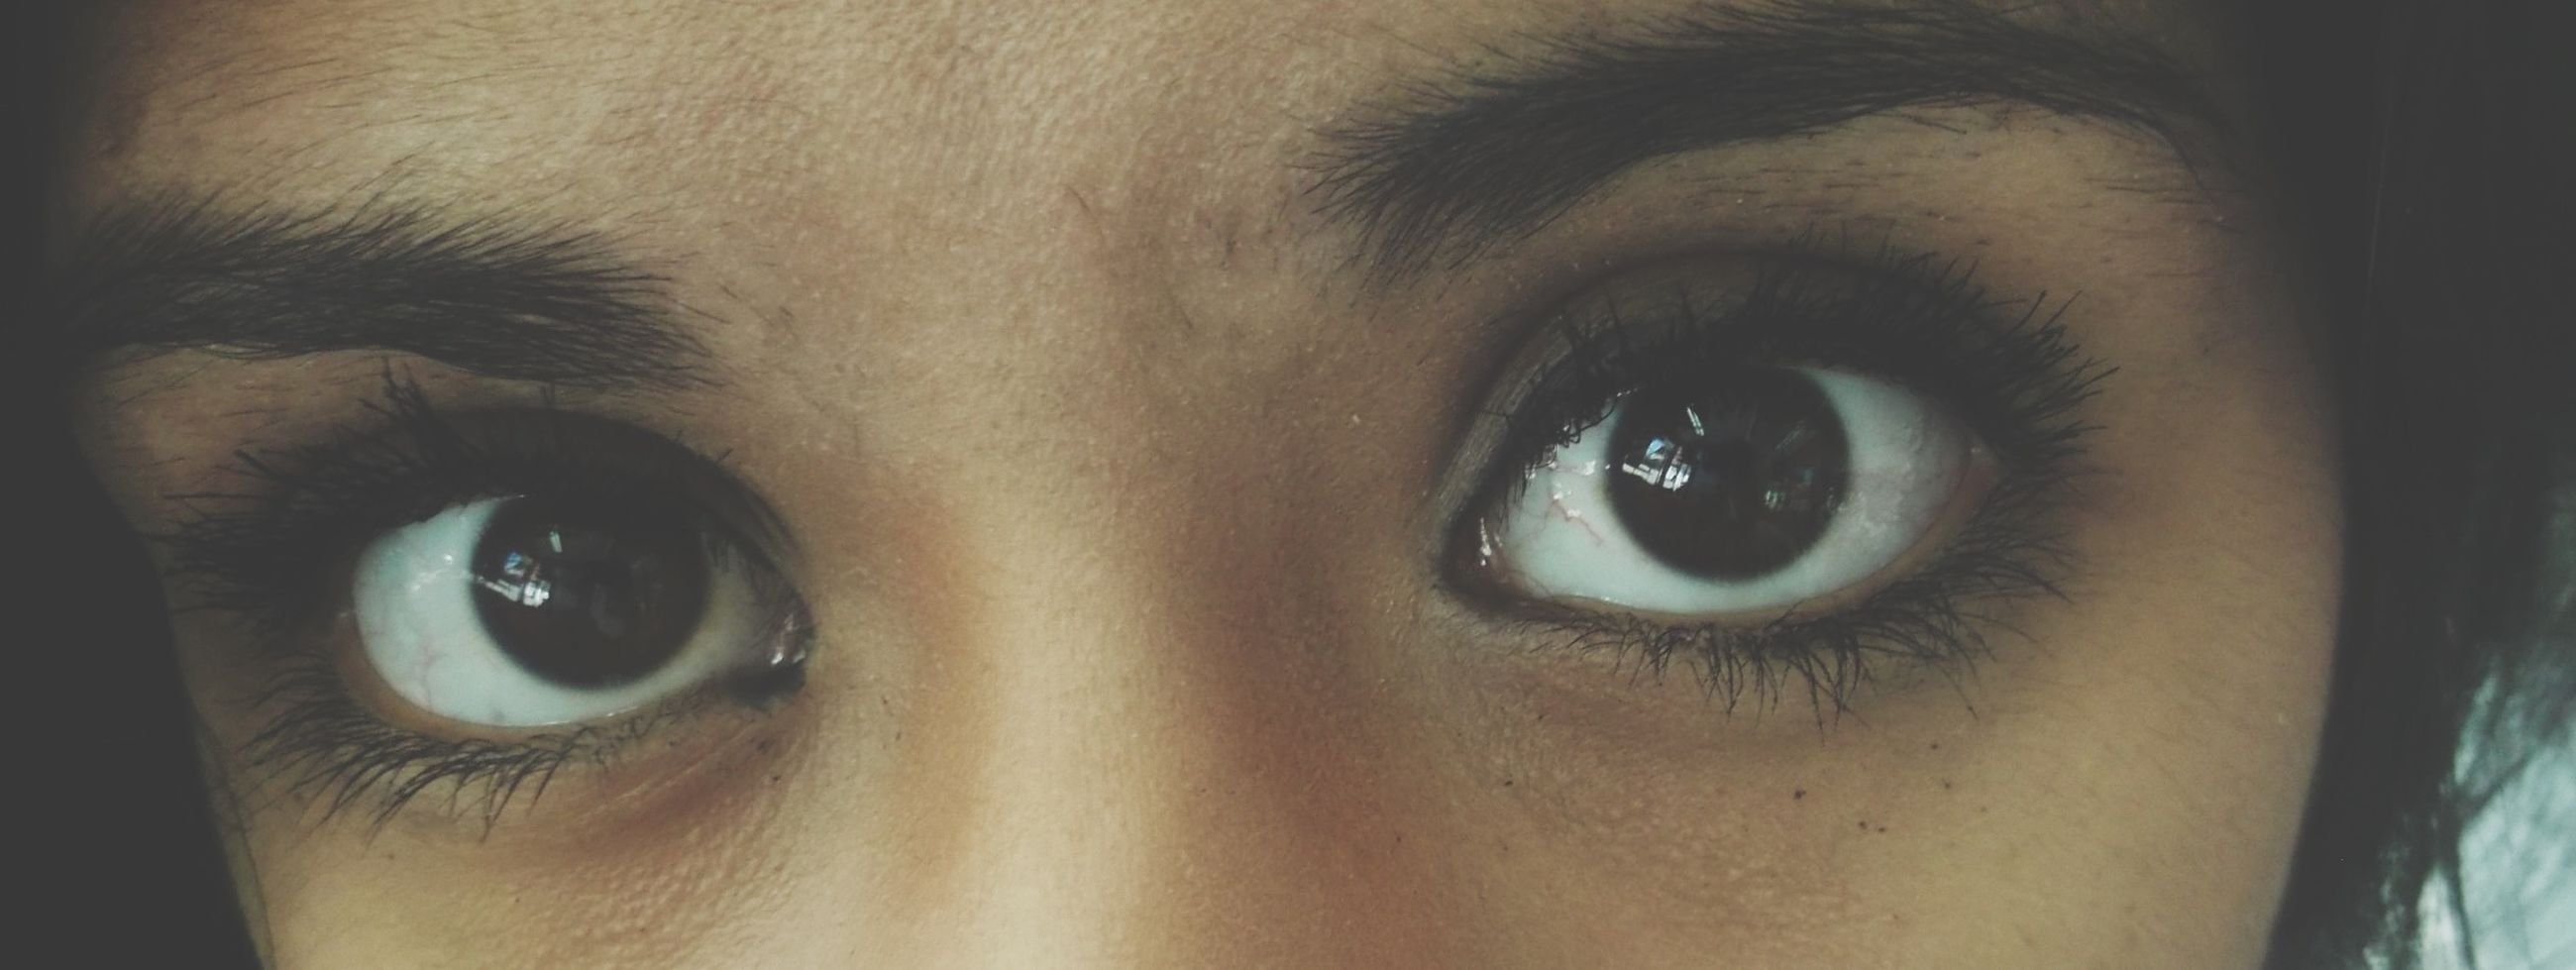 close-up, human eye, part of, looking at camera, portrait, human face, human skin, eyelash, indoors, eyesight, lifestyles, extreme close-up, extreme close up, sensory perception, full frame, headshot, detail